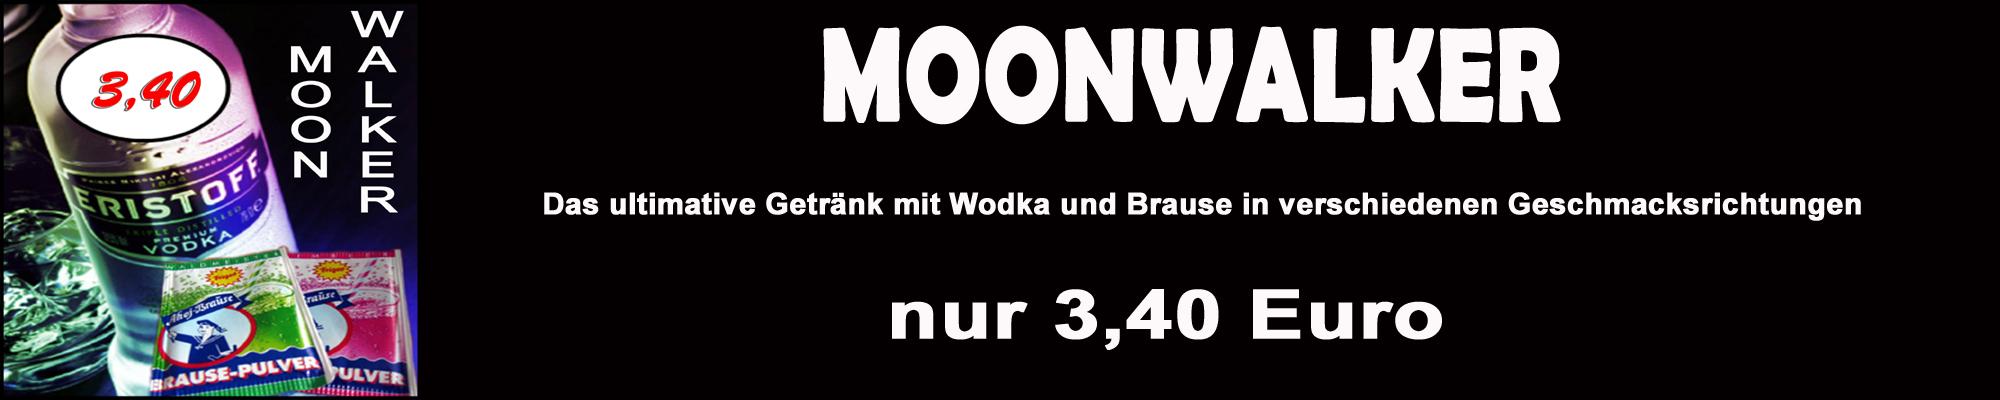 Getränkeaktion-Moonwalker-Kopie